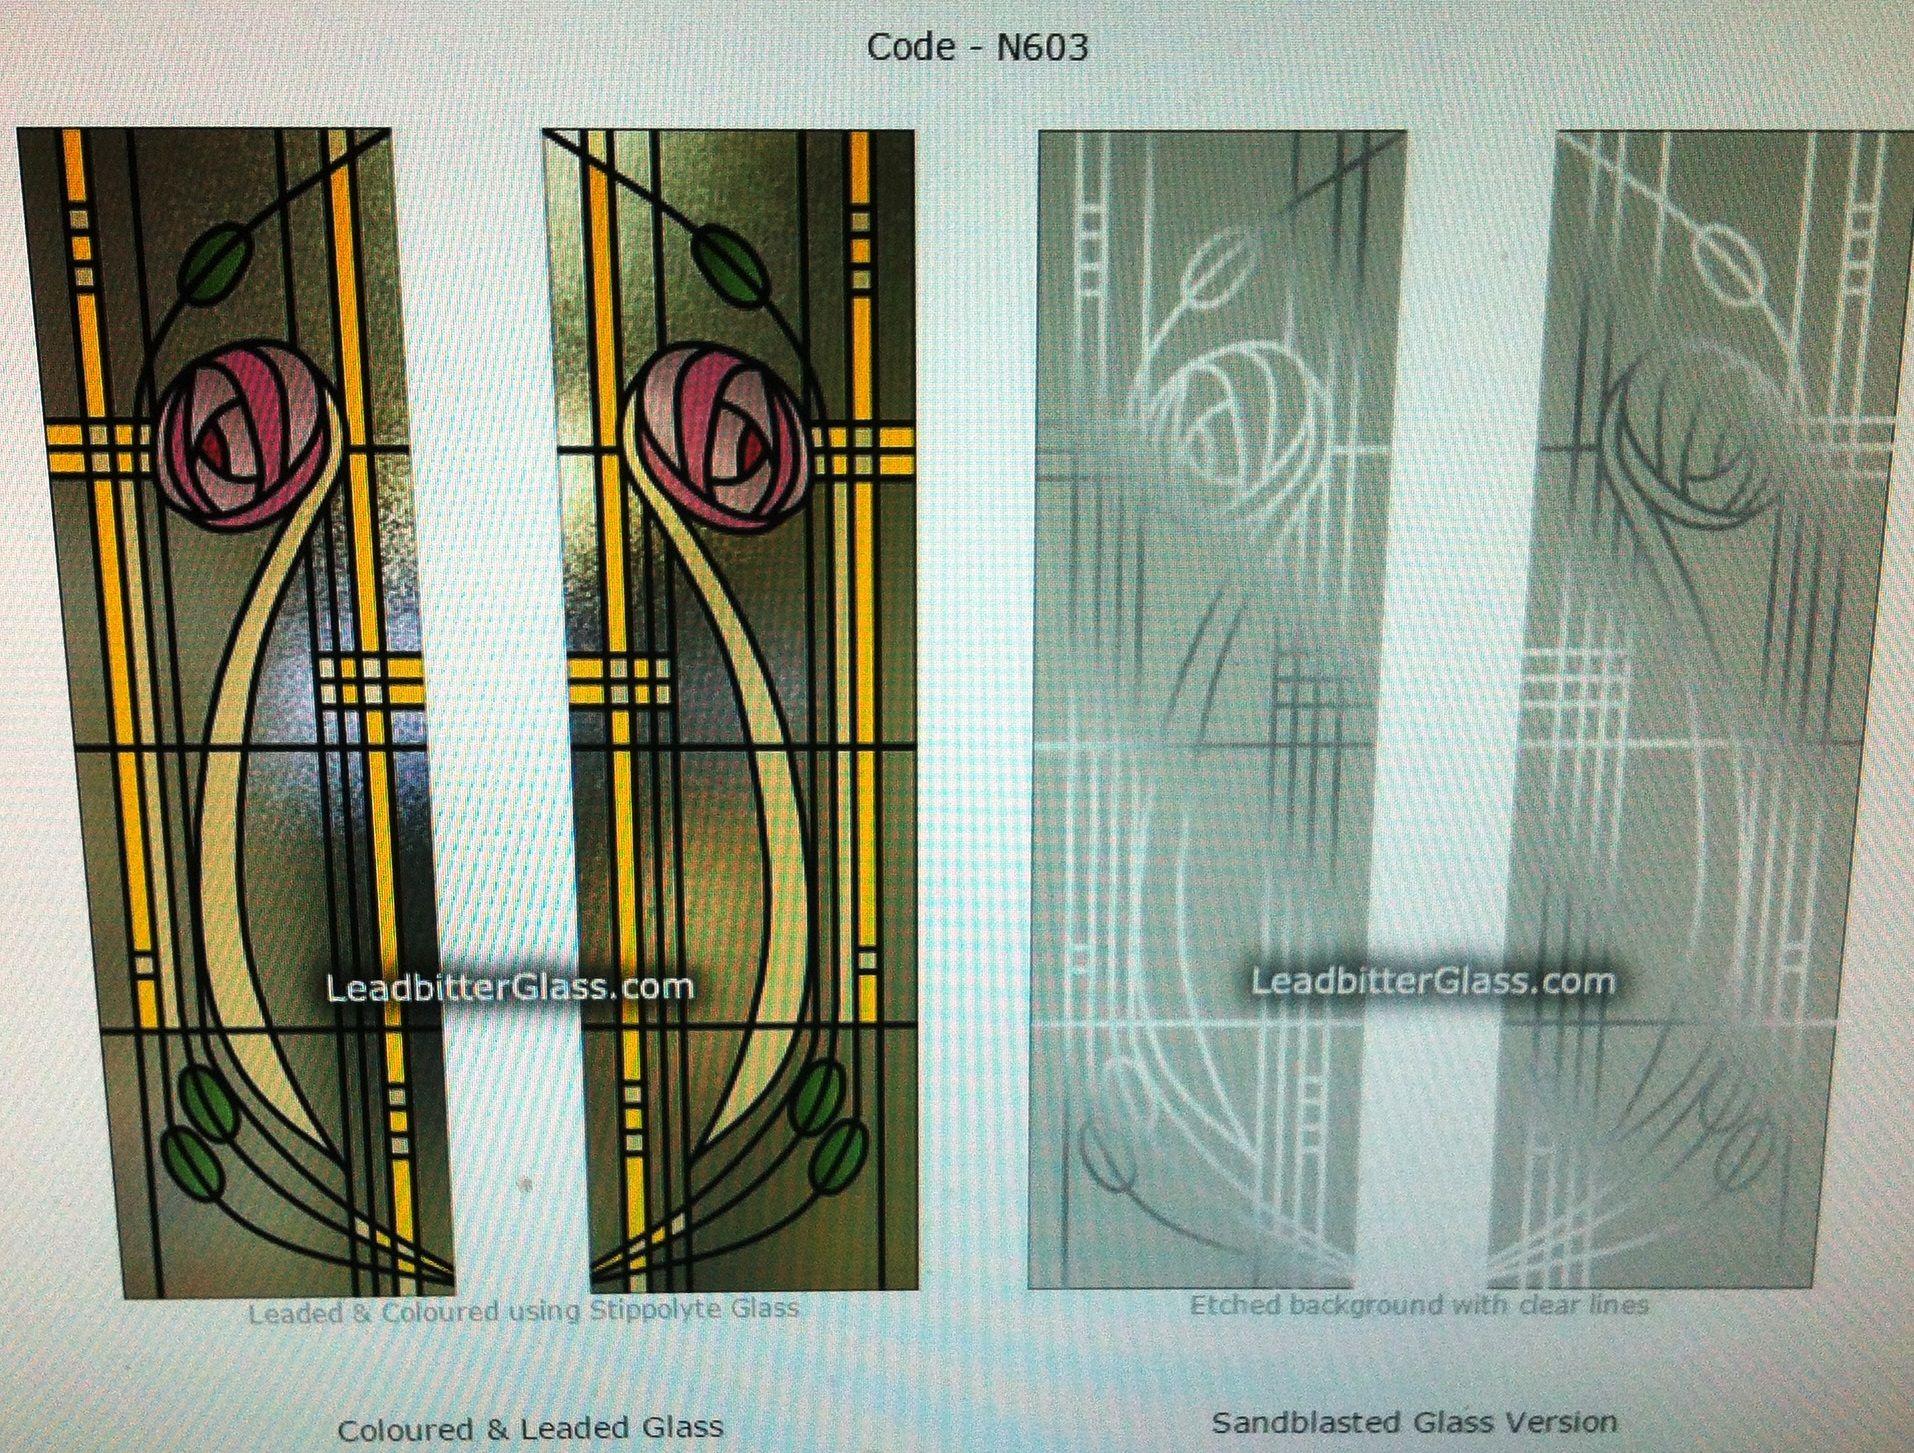 Rose Mackintosh  http://leadbitterglass.com/stained_glass/charles_rennie_mackintosh_doors_patterns.htm